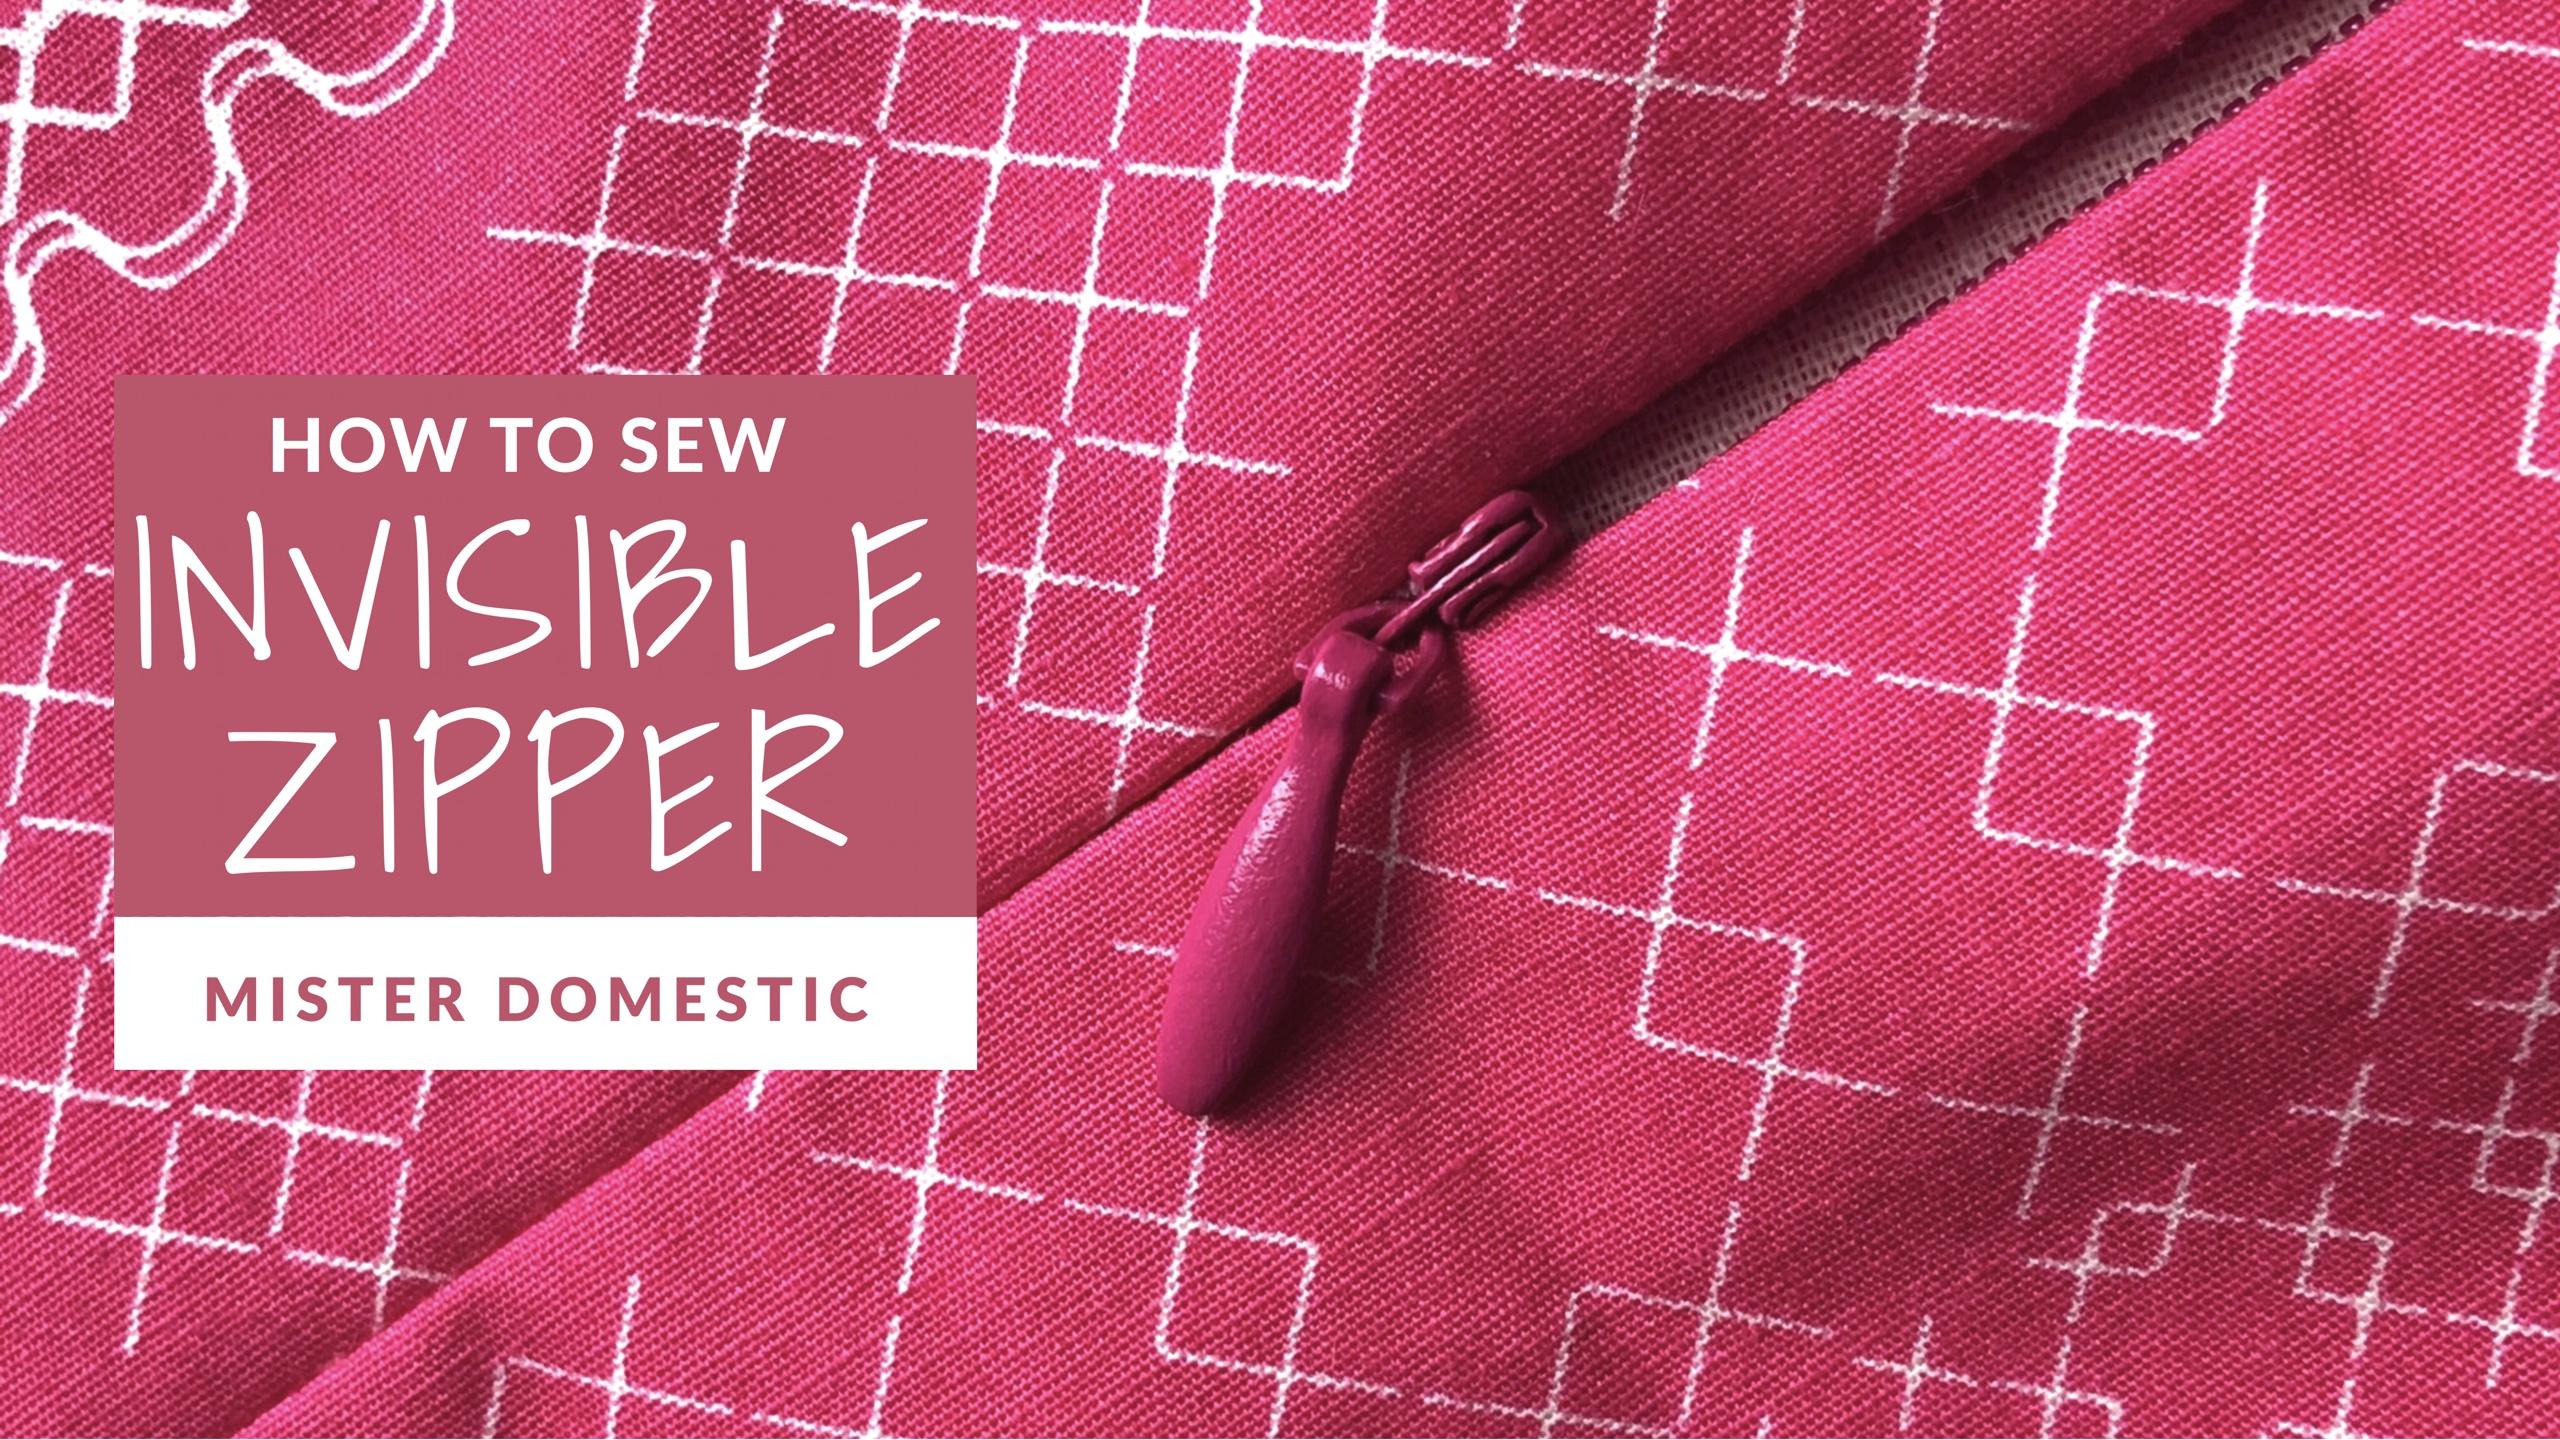 Invisible zipper copy.jpg